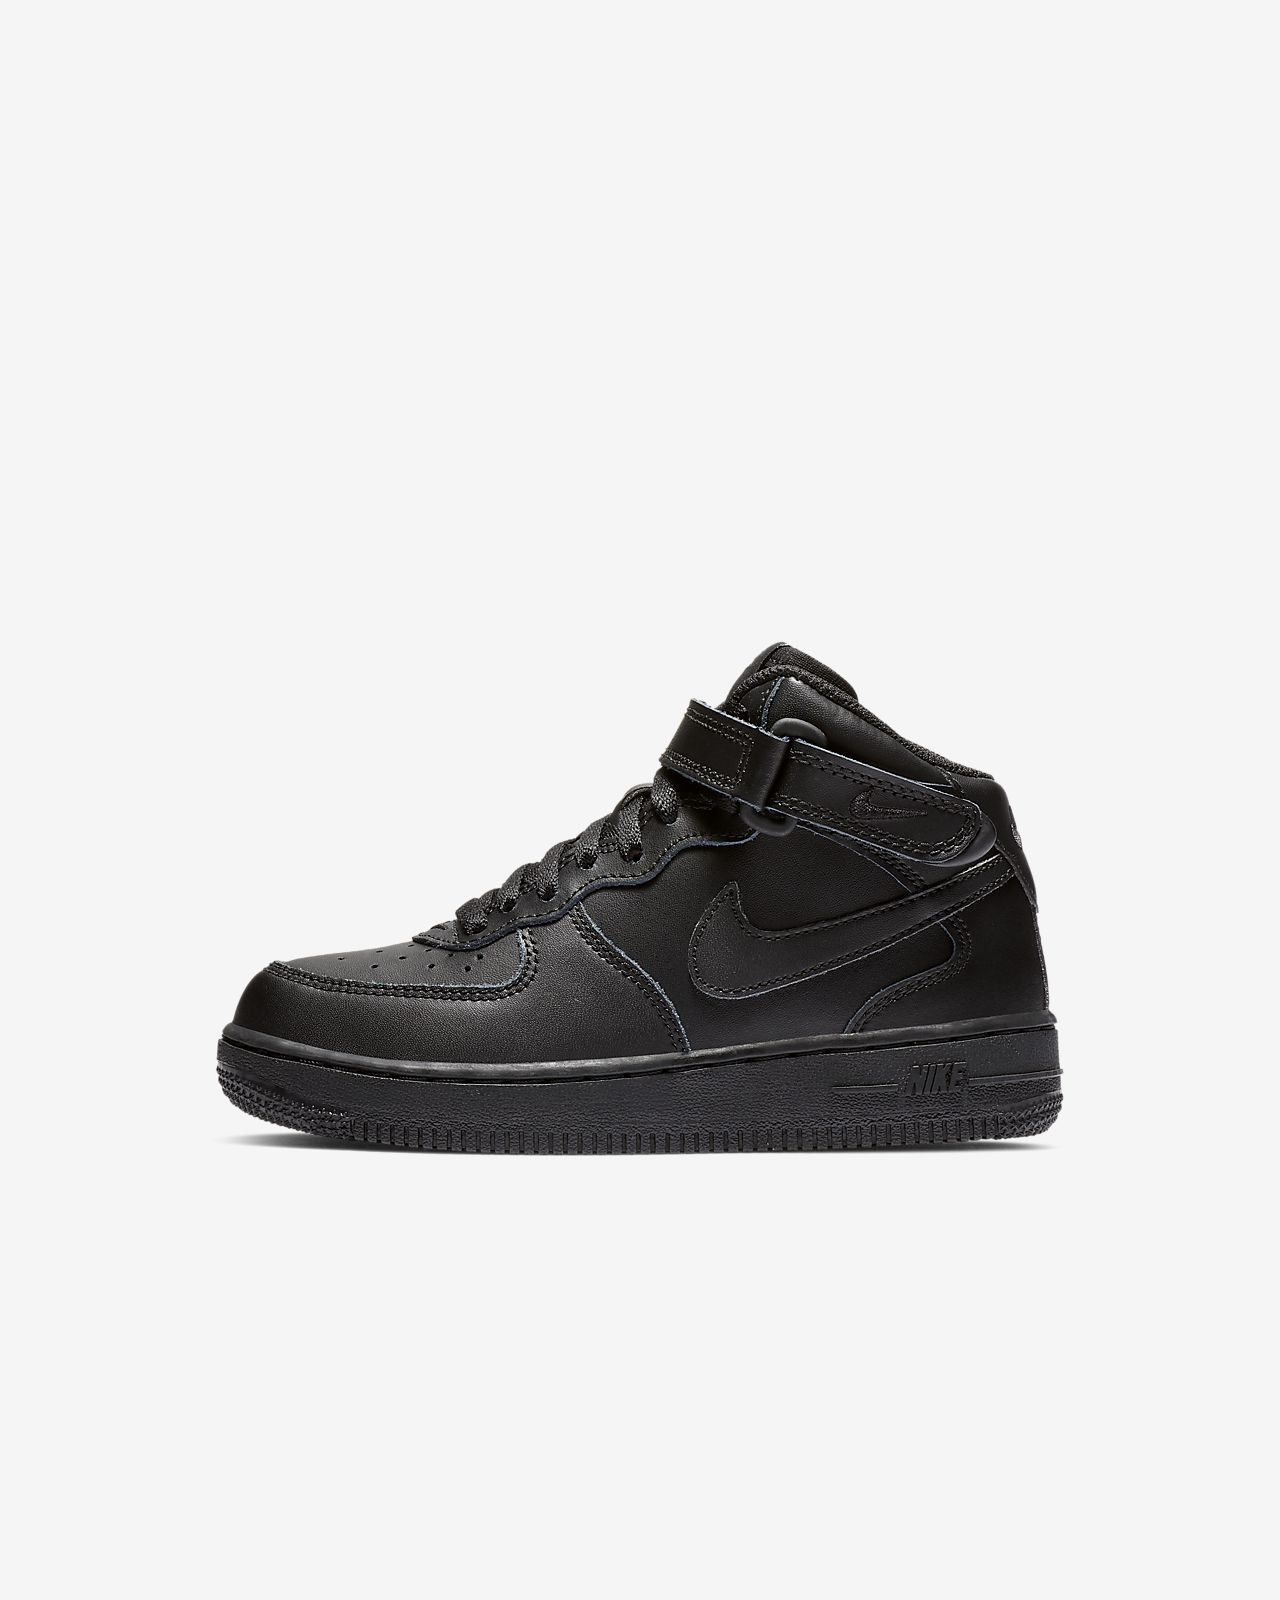 Calzado para niños talla pequeña Nike Air Force 1 Mid